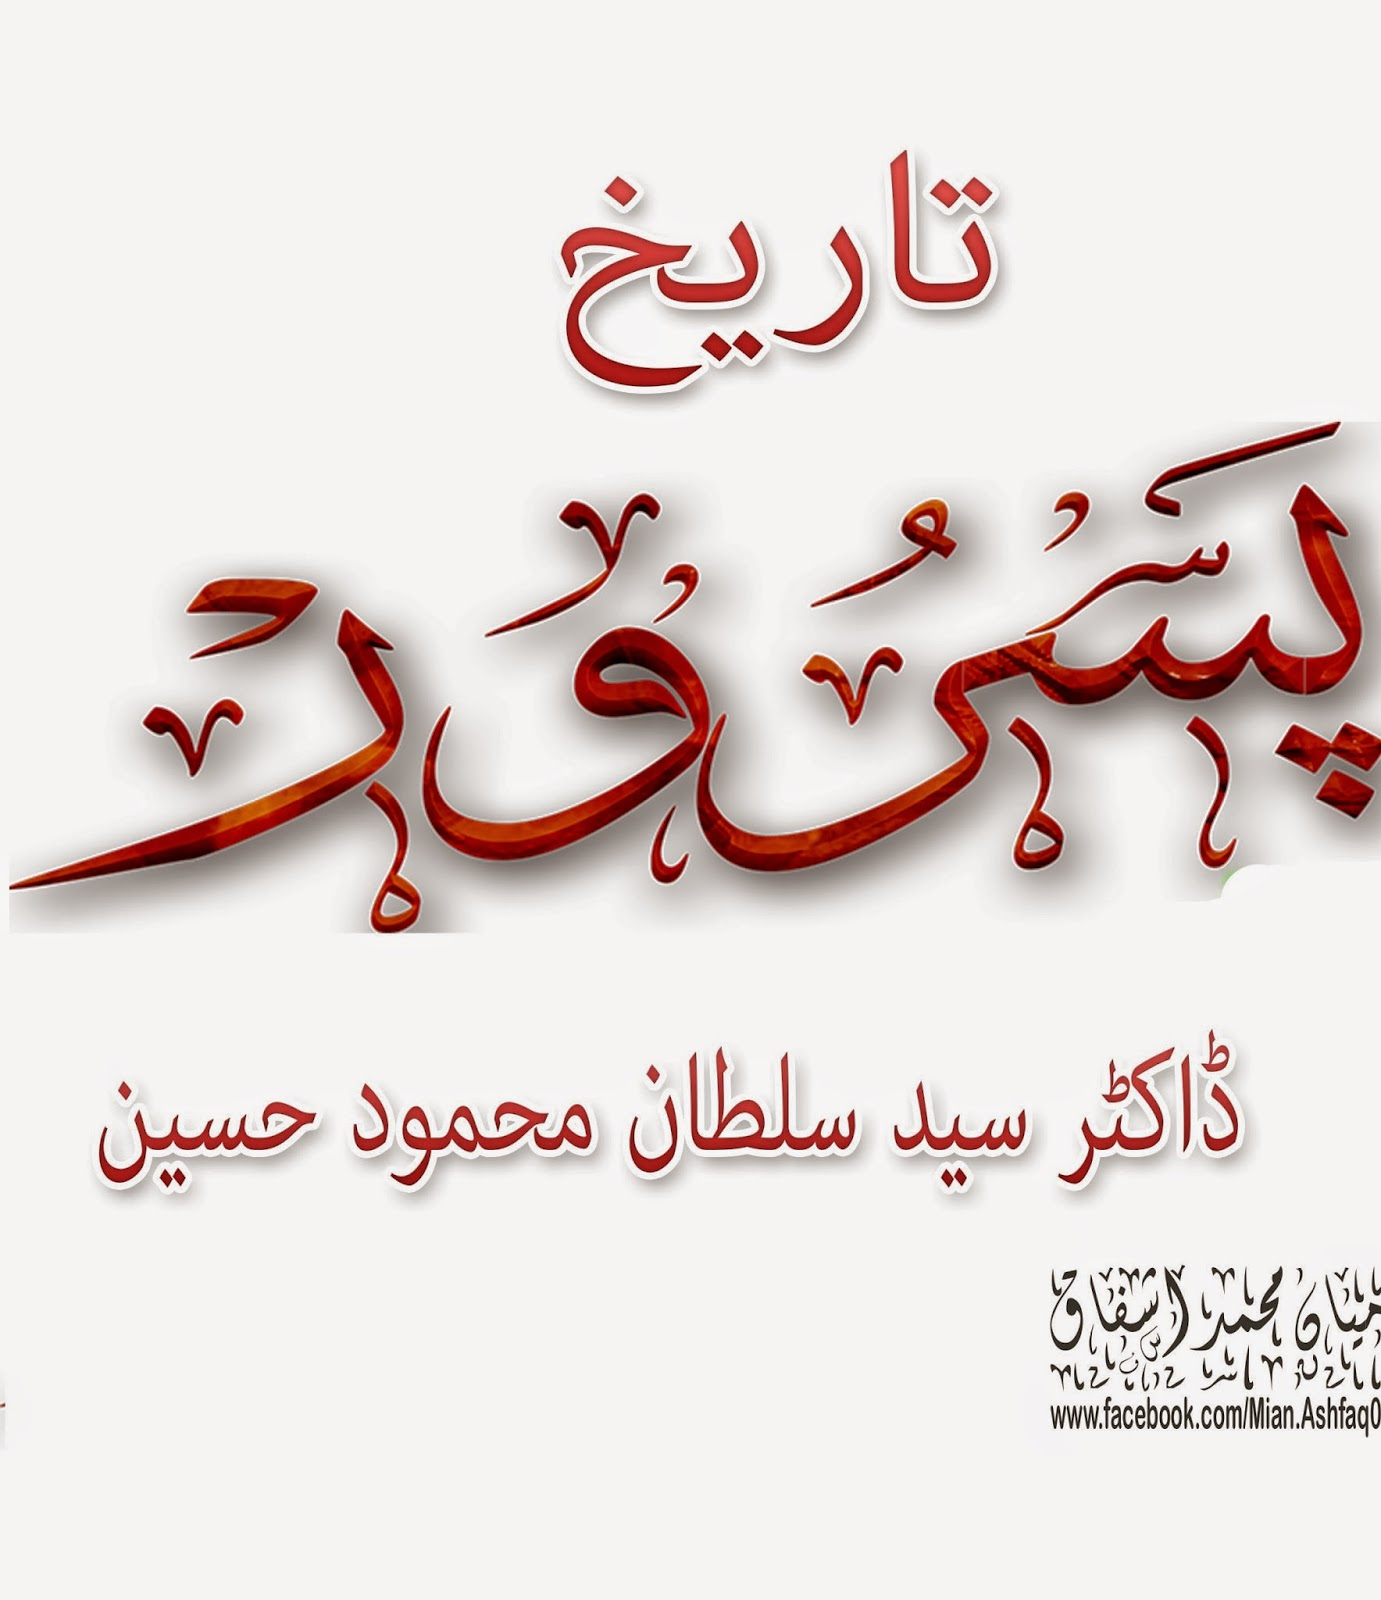 Pasrur, History of Pasrur, Pasrur of History, پسرور، تاریخ پسرور,